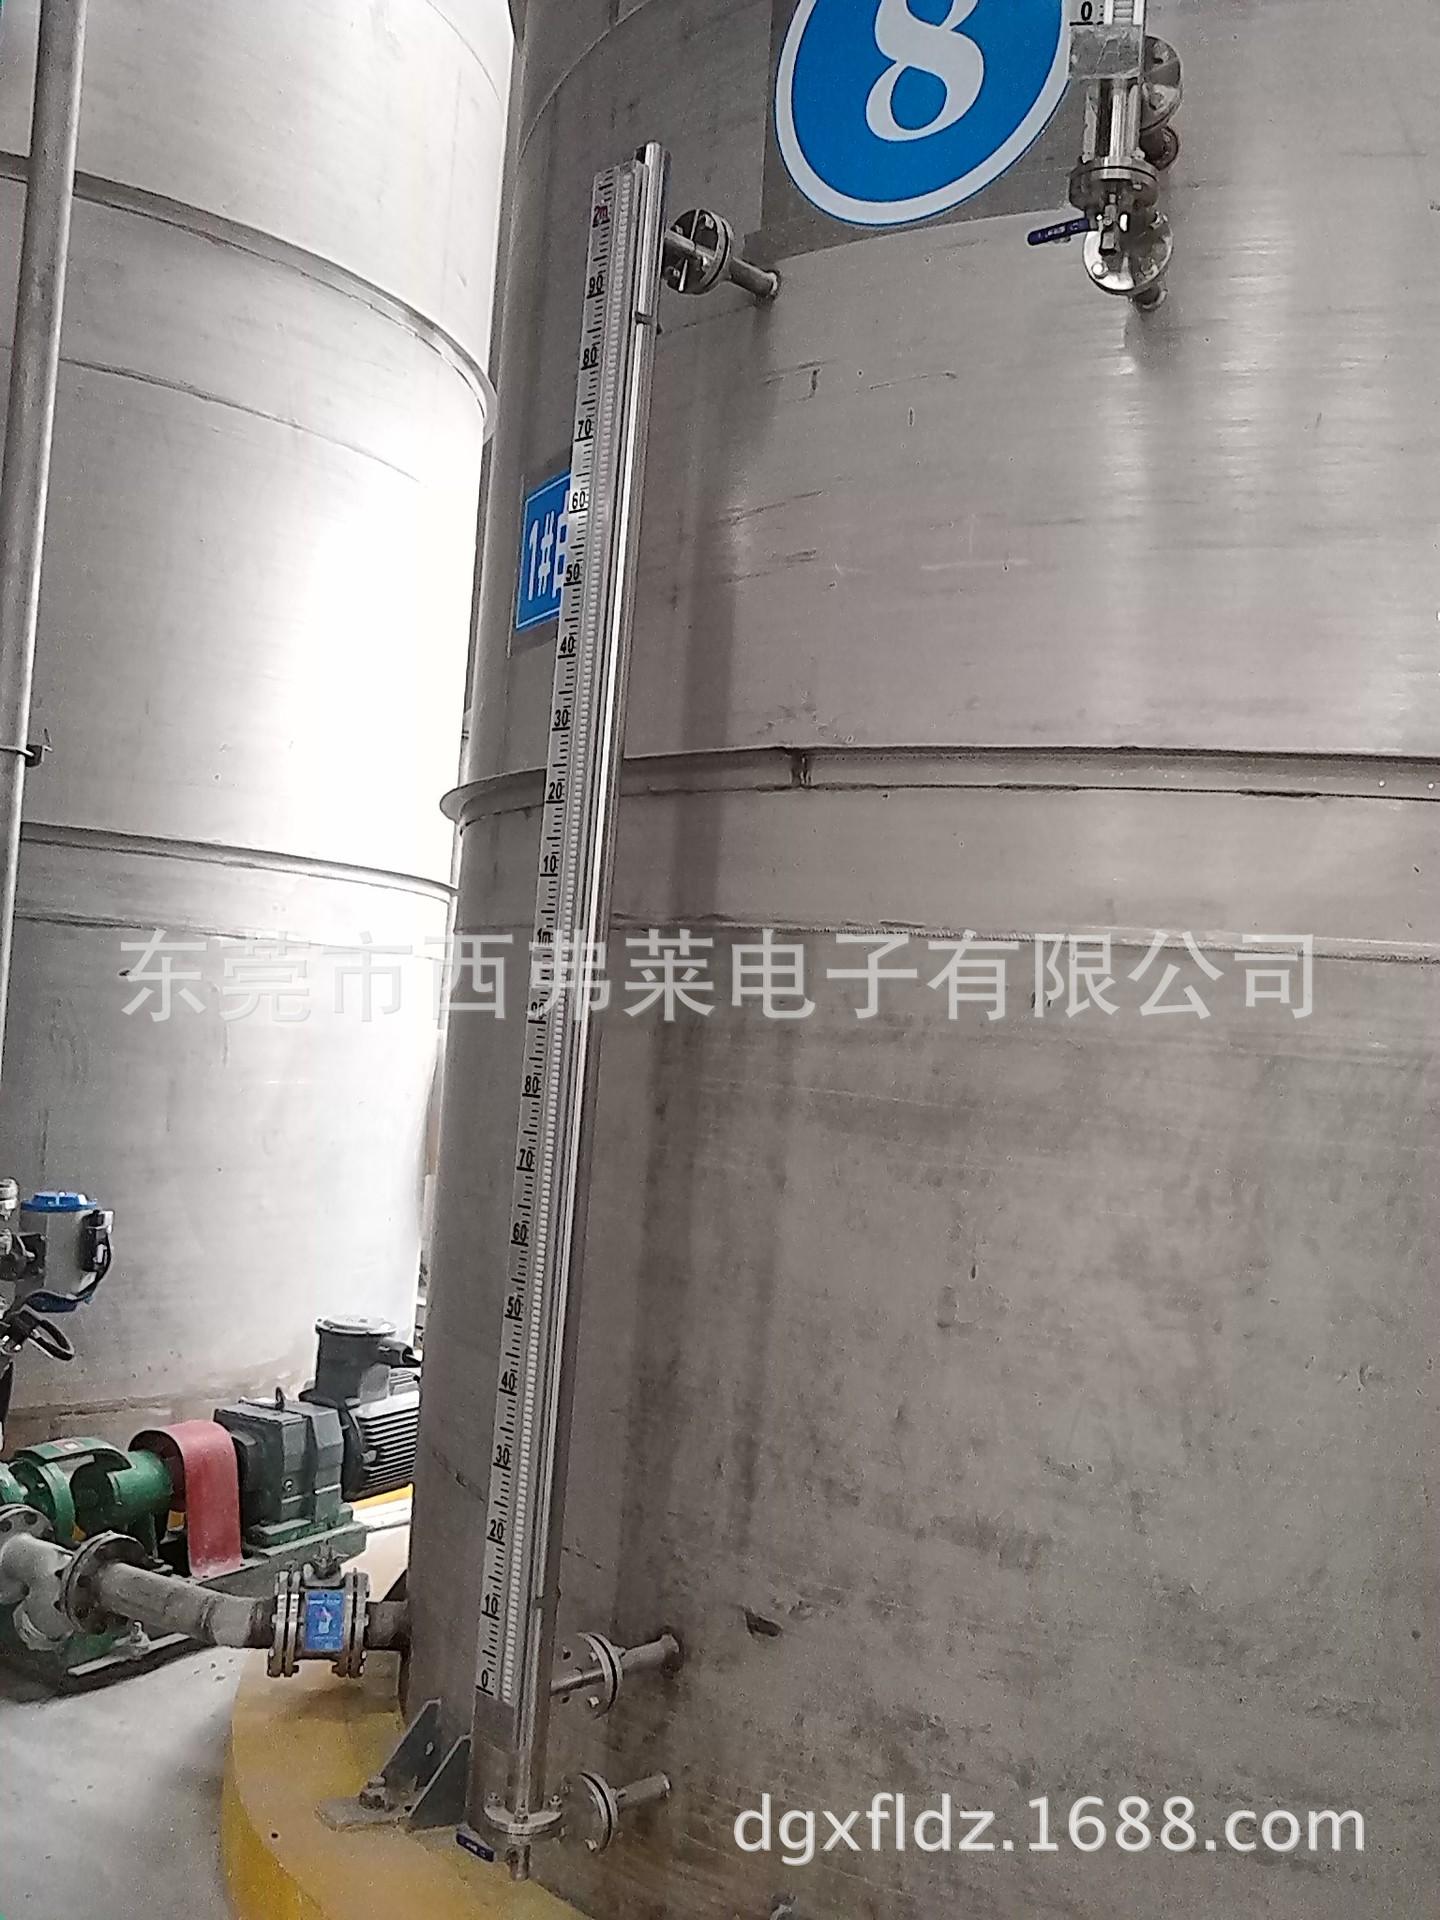 DN20法兰磁翻柱液位计|广东活动法兰安装磁翻板液位计